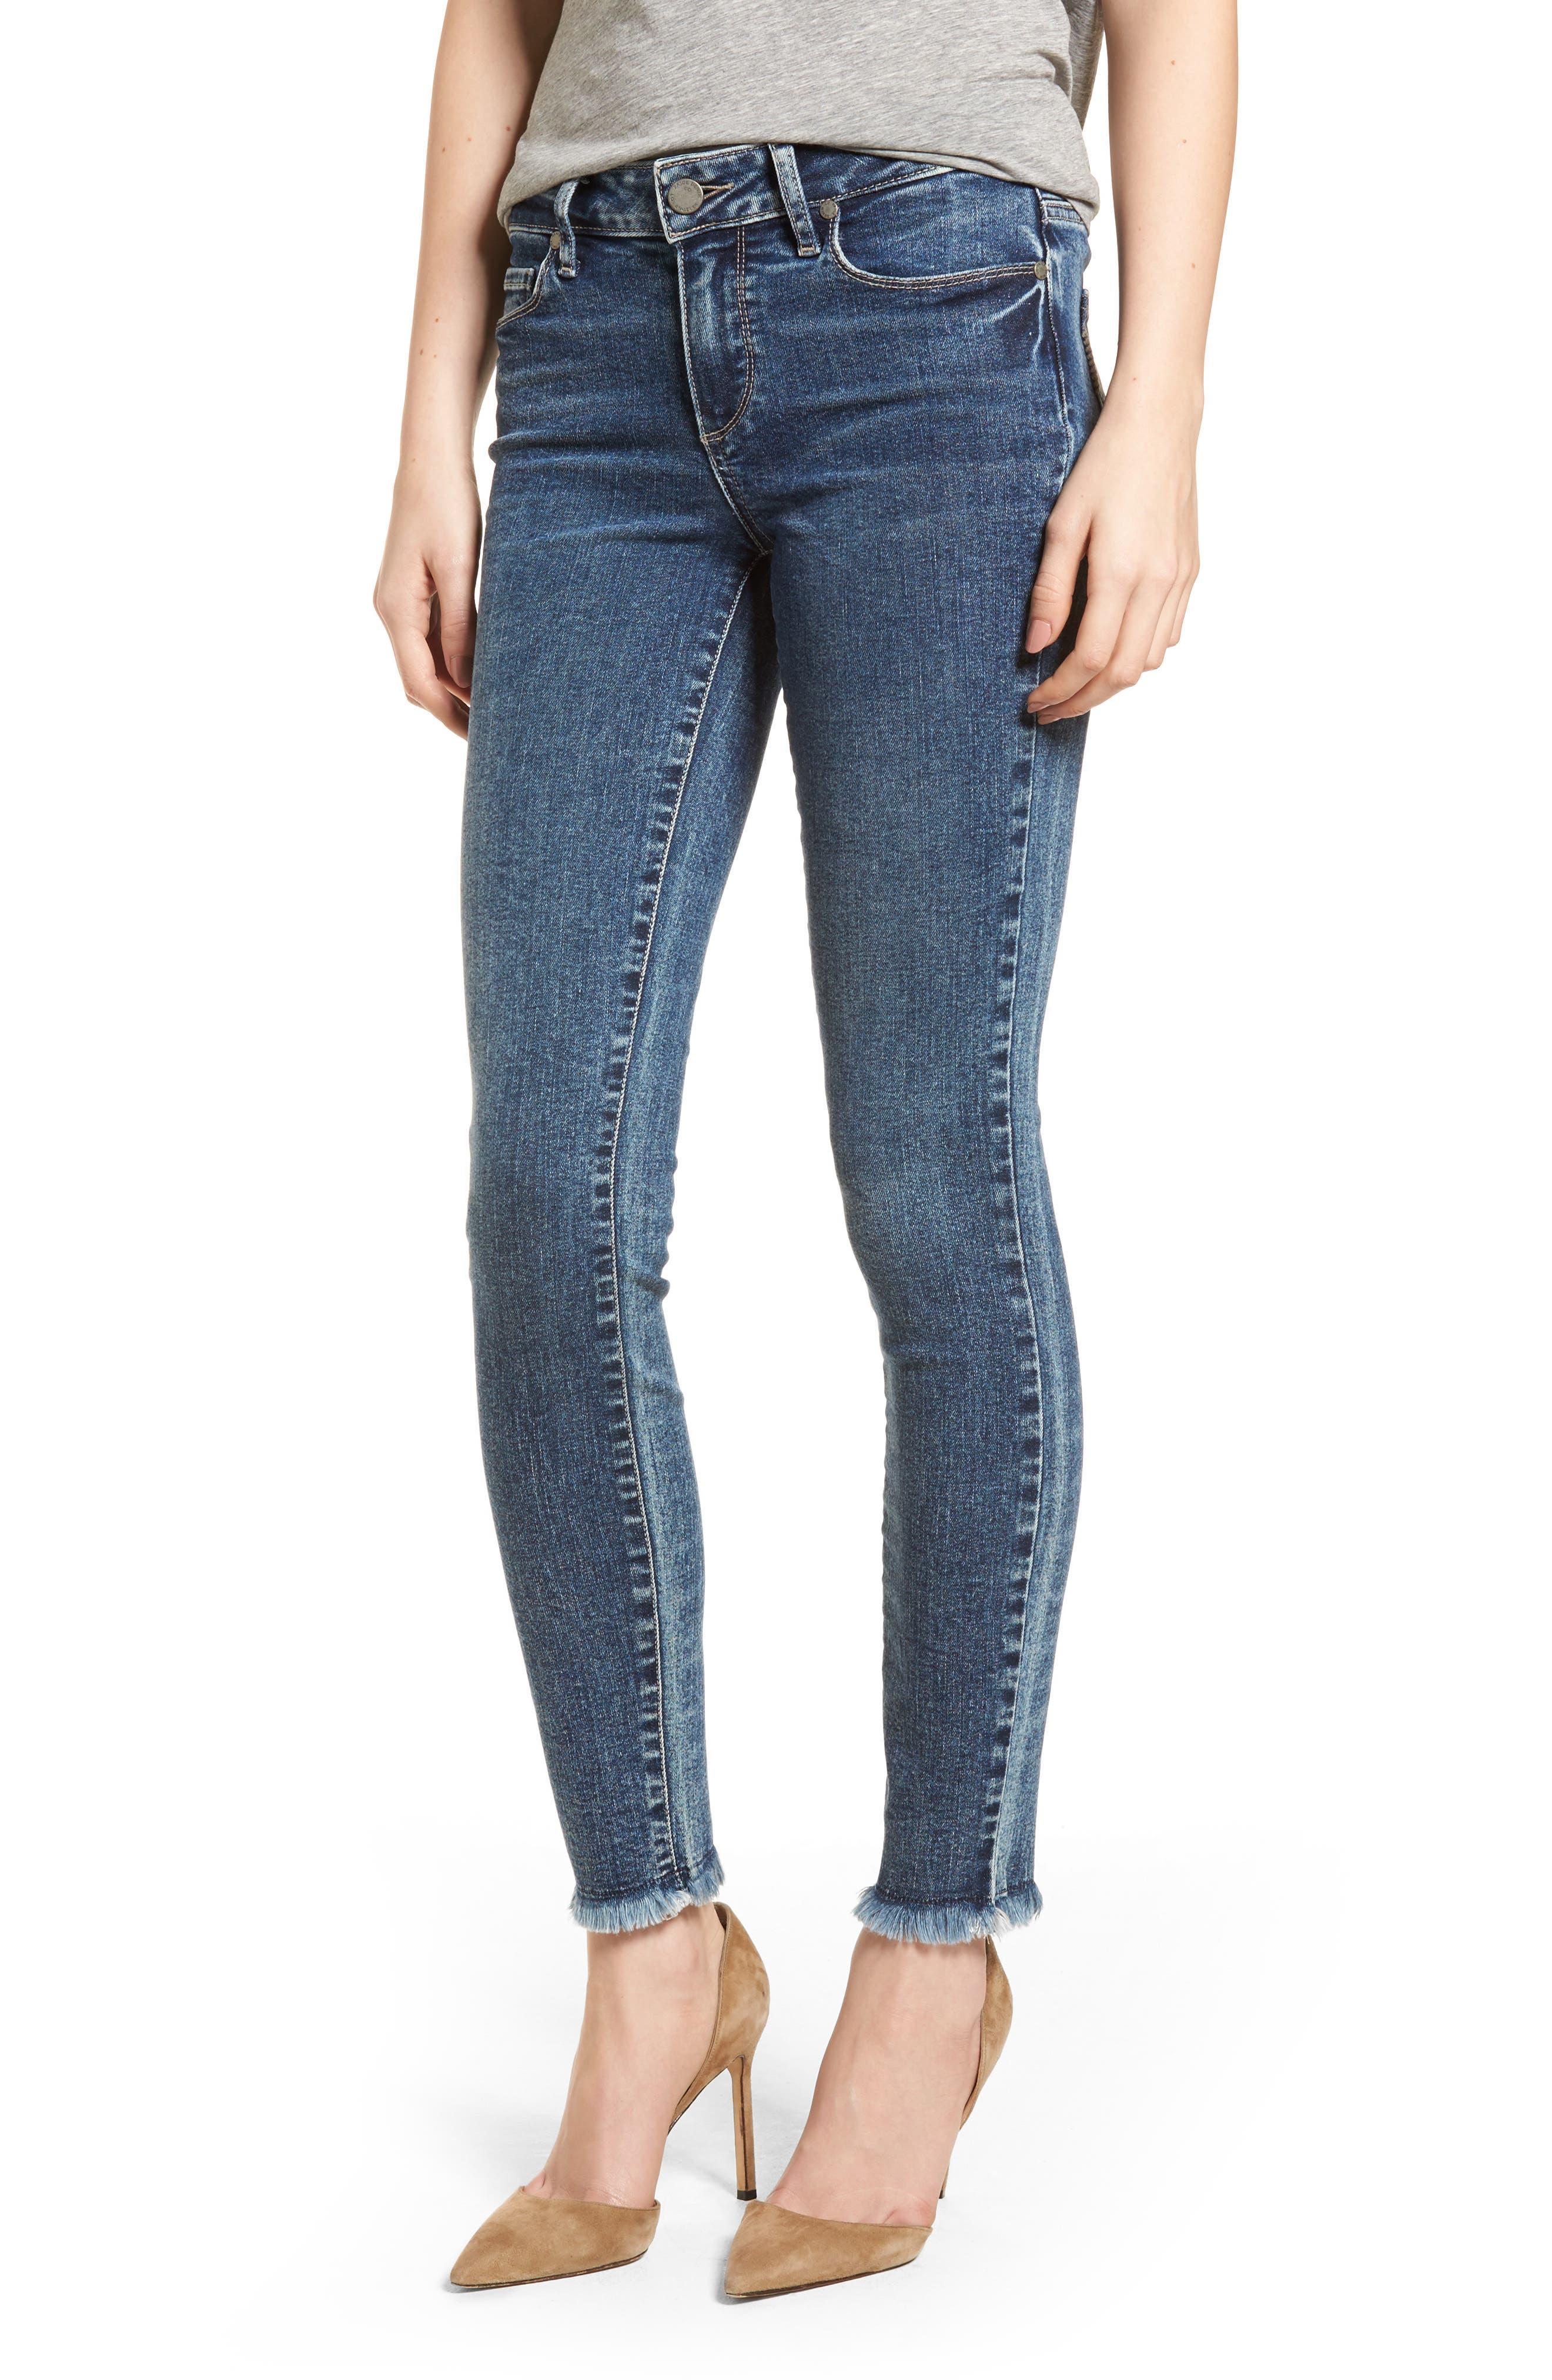 Transcend Vintage - Verdugo Ultra Skinny Jeans,                         Main,                         color, Iness